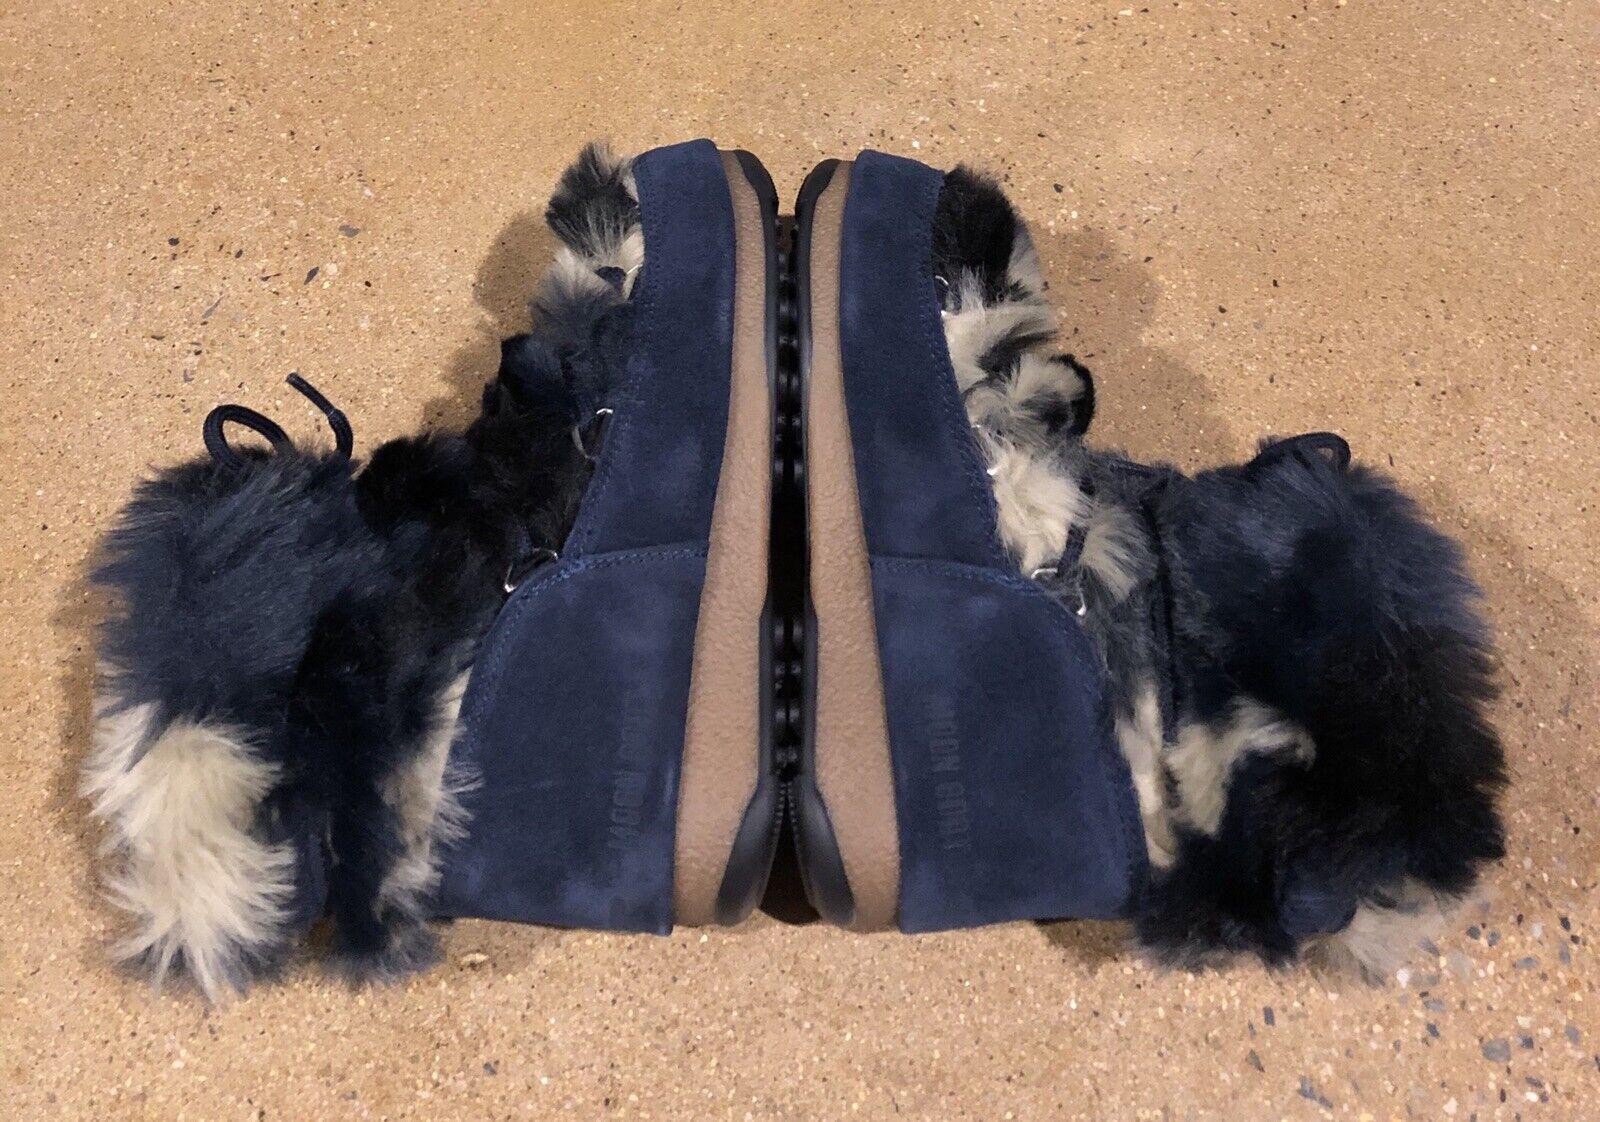 Tecnica Moon Boots W.E. Low Fur Size 36 EUR The Original Moon Boots Size 5.5 US